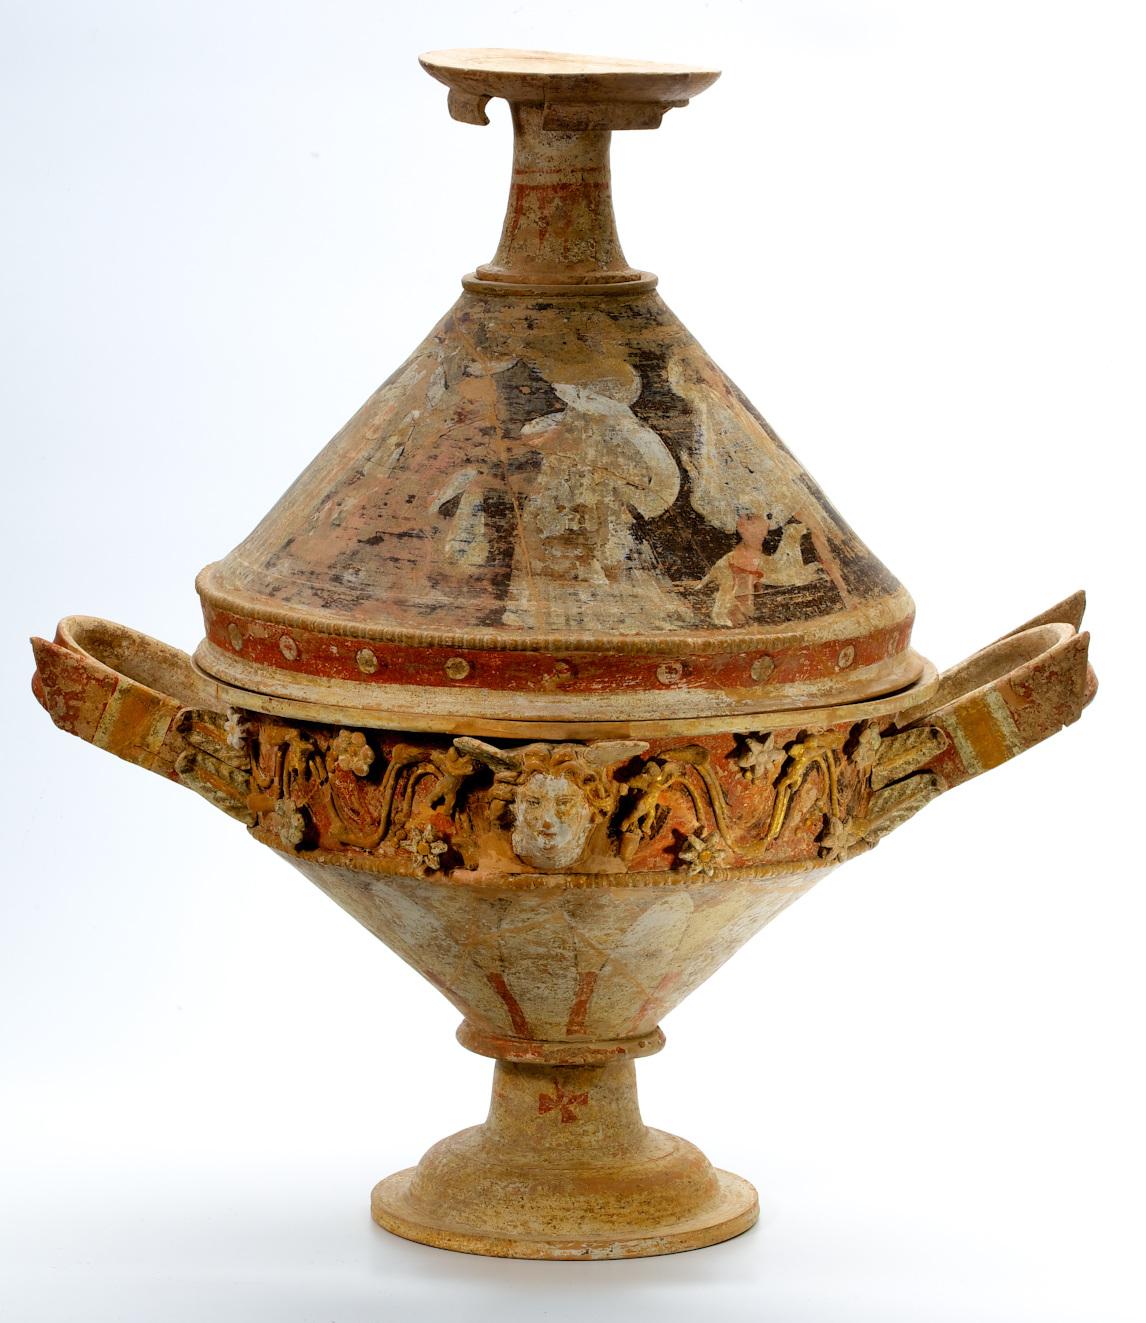 Polychrome Relieflekanis aus Centuripe, Dionysische Szene, 3./2. Jh. v. Chr. (Foto: Hetjens - Deutsches Keramikmuseum)